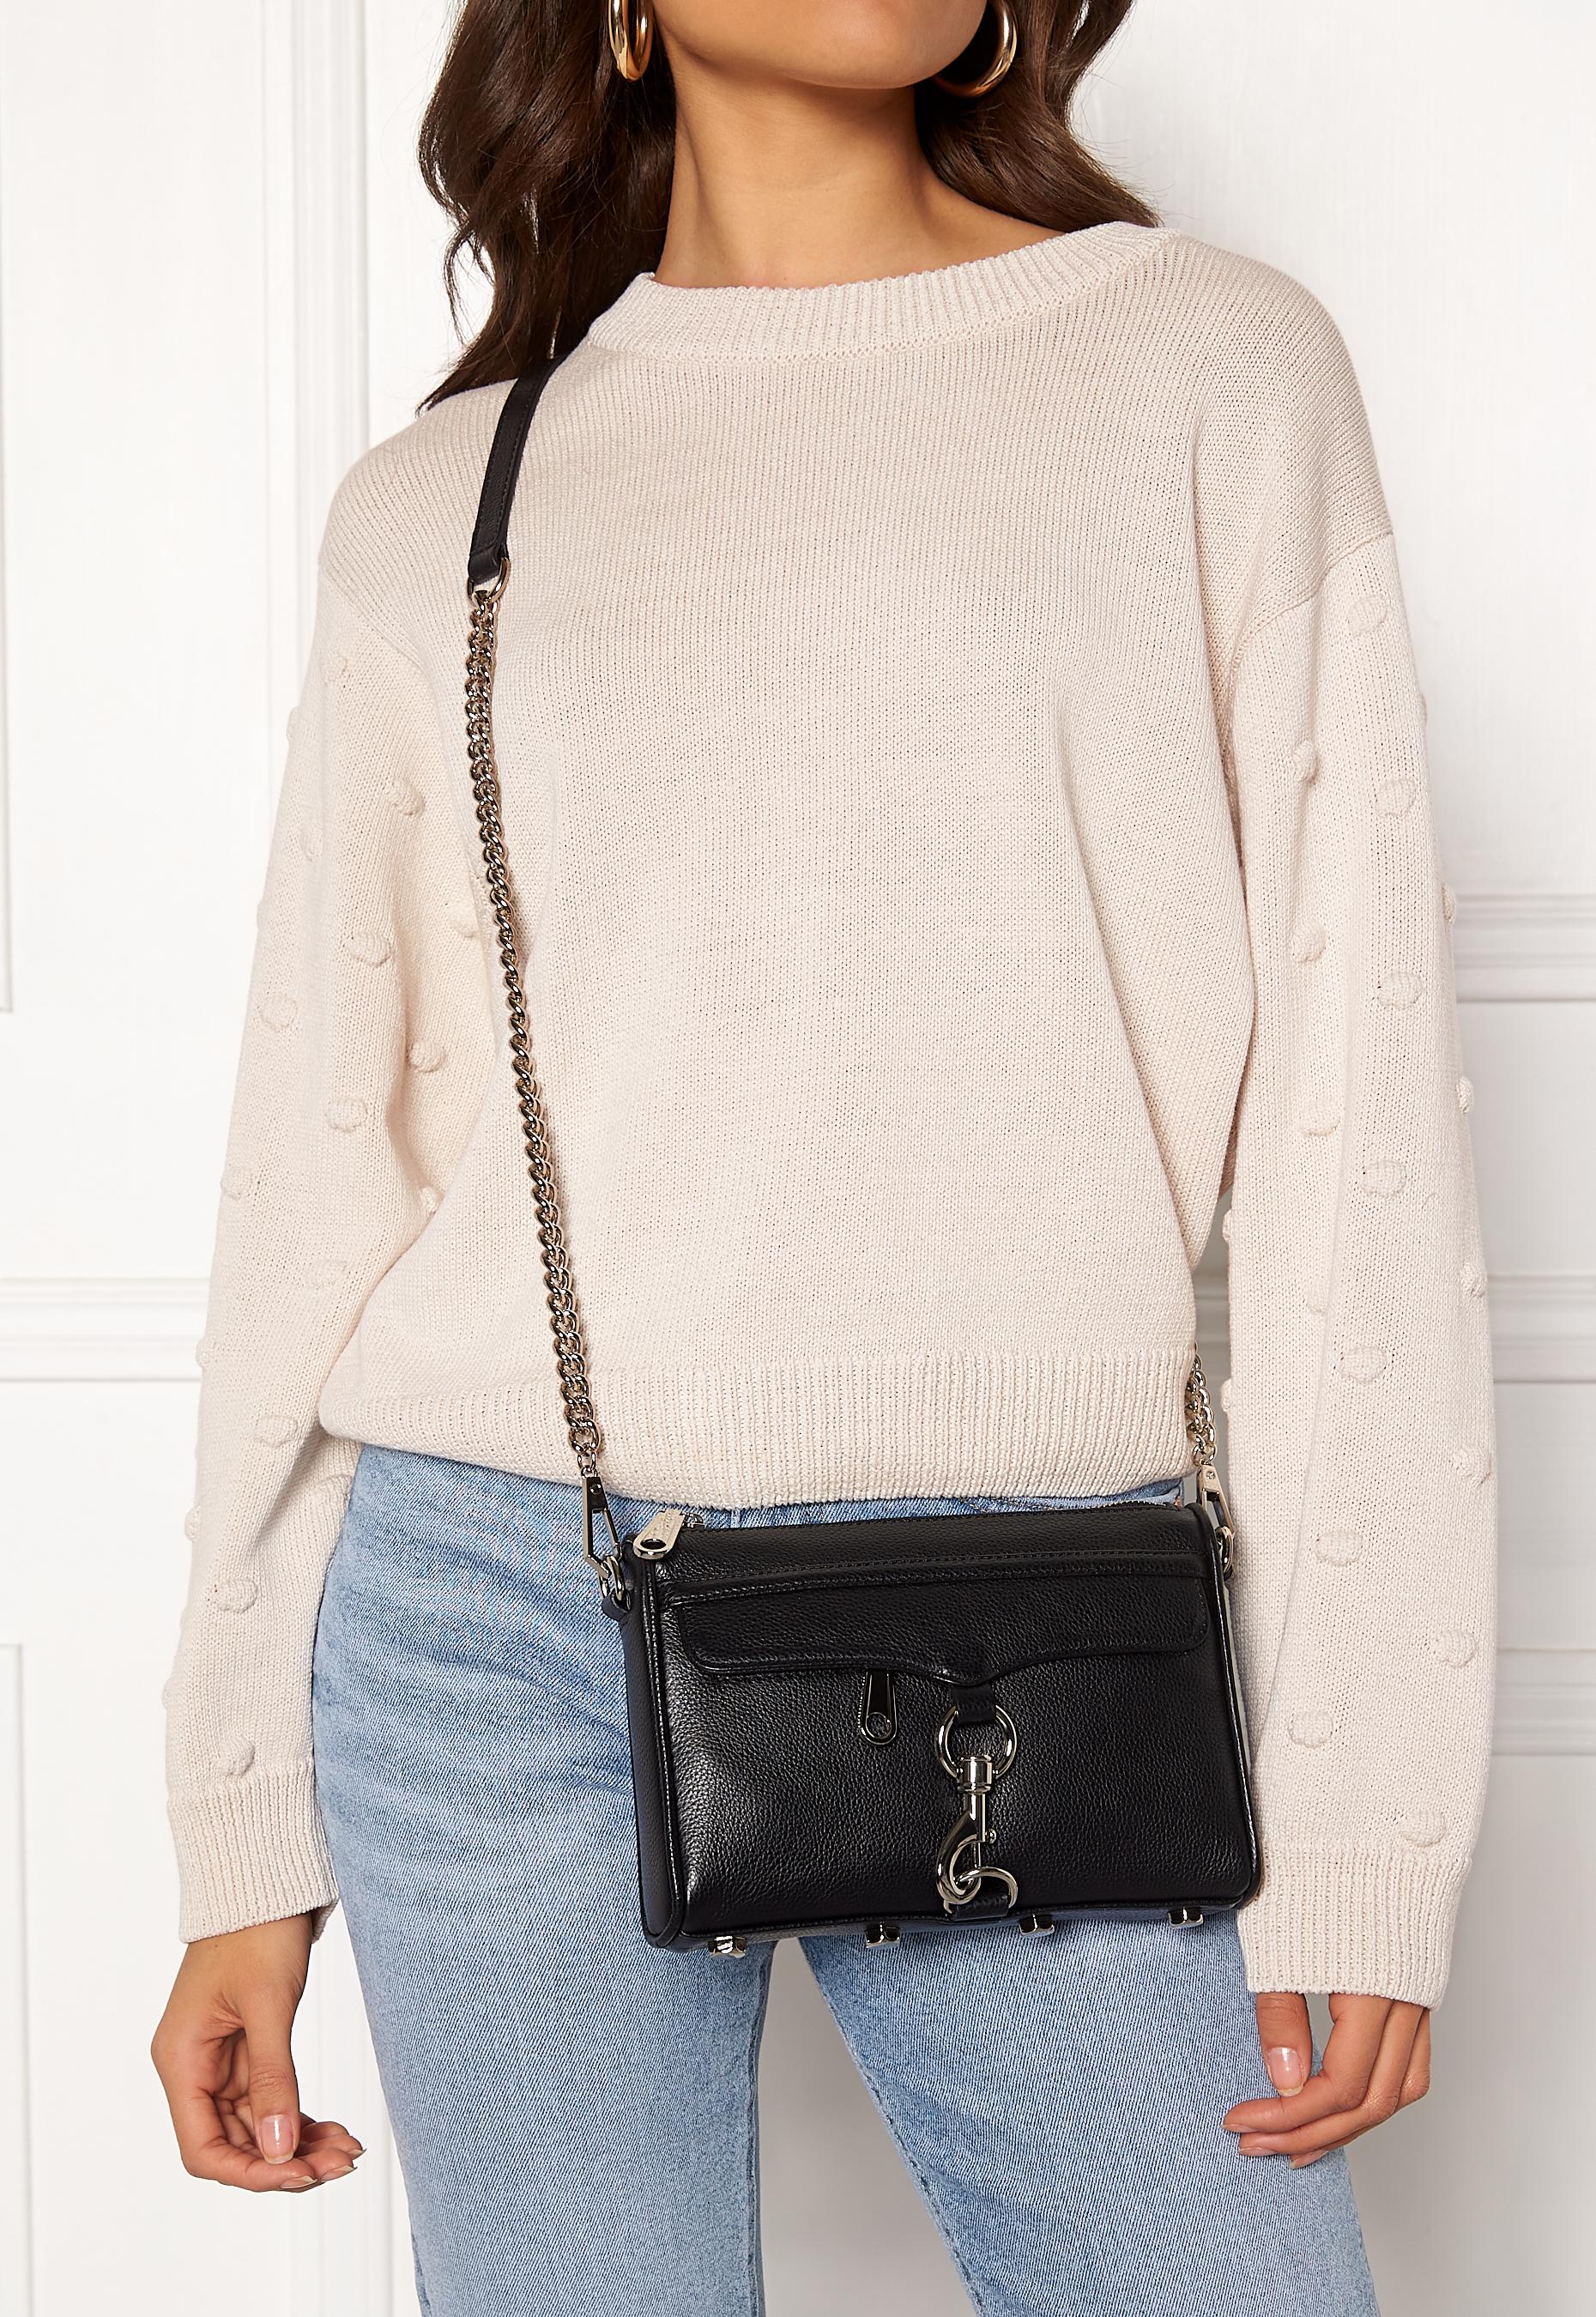 Keine Verkaufssteuer großartiges Aussehen fairer Preis Rebecca Minkoff Mini Mac Pebble Strap Bag Black - Bubbleroom